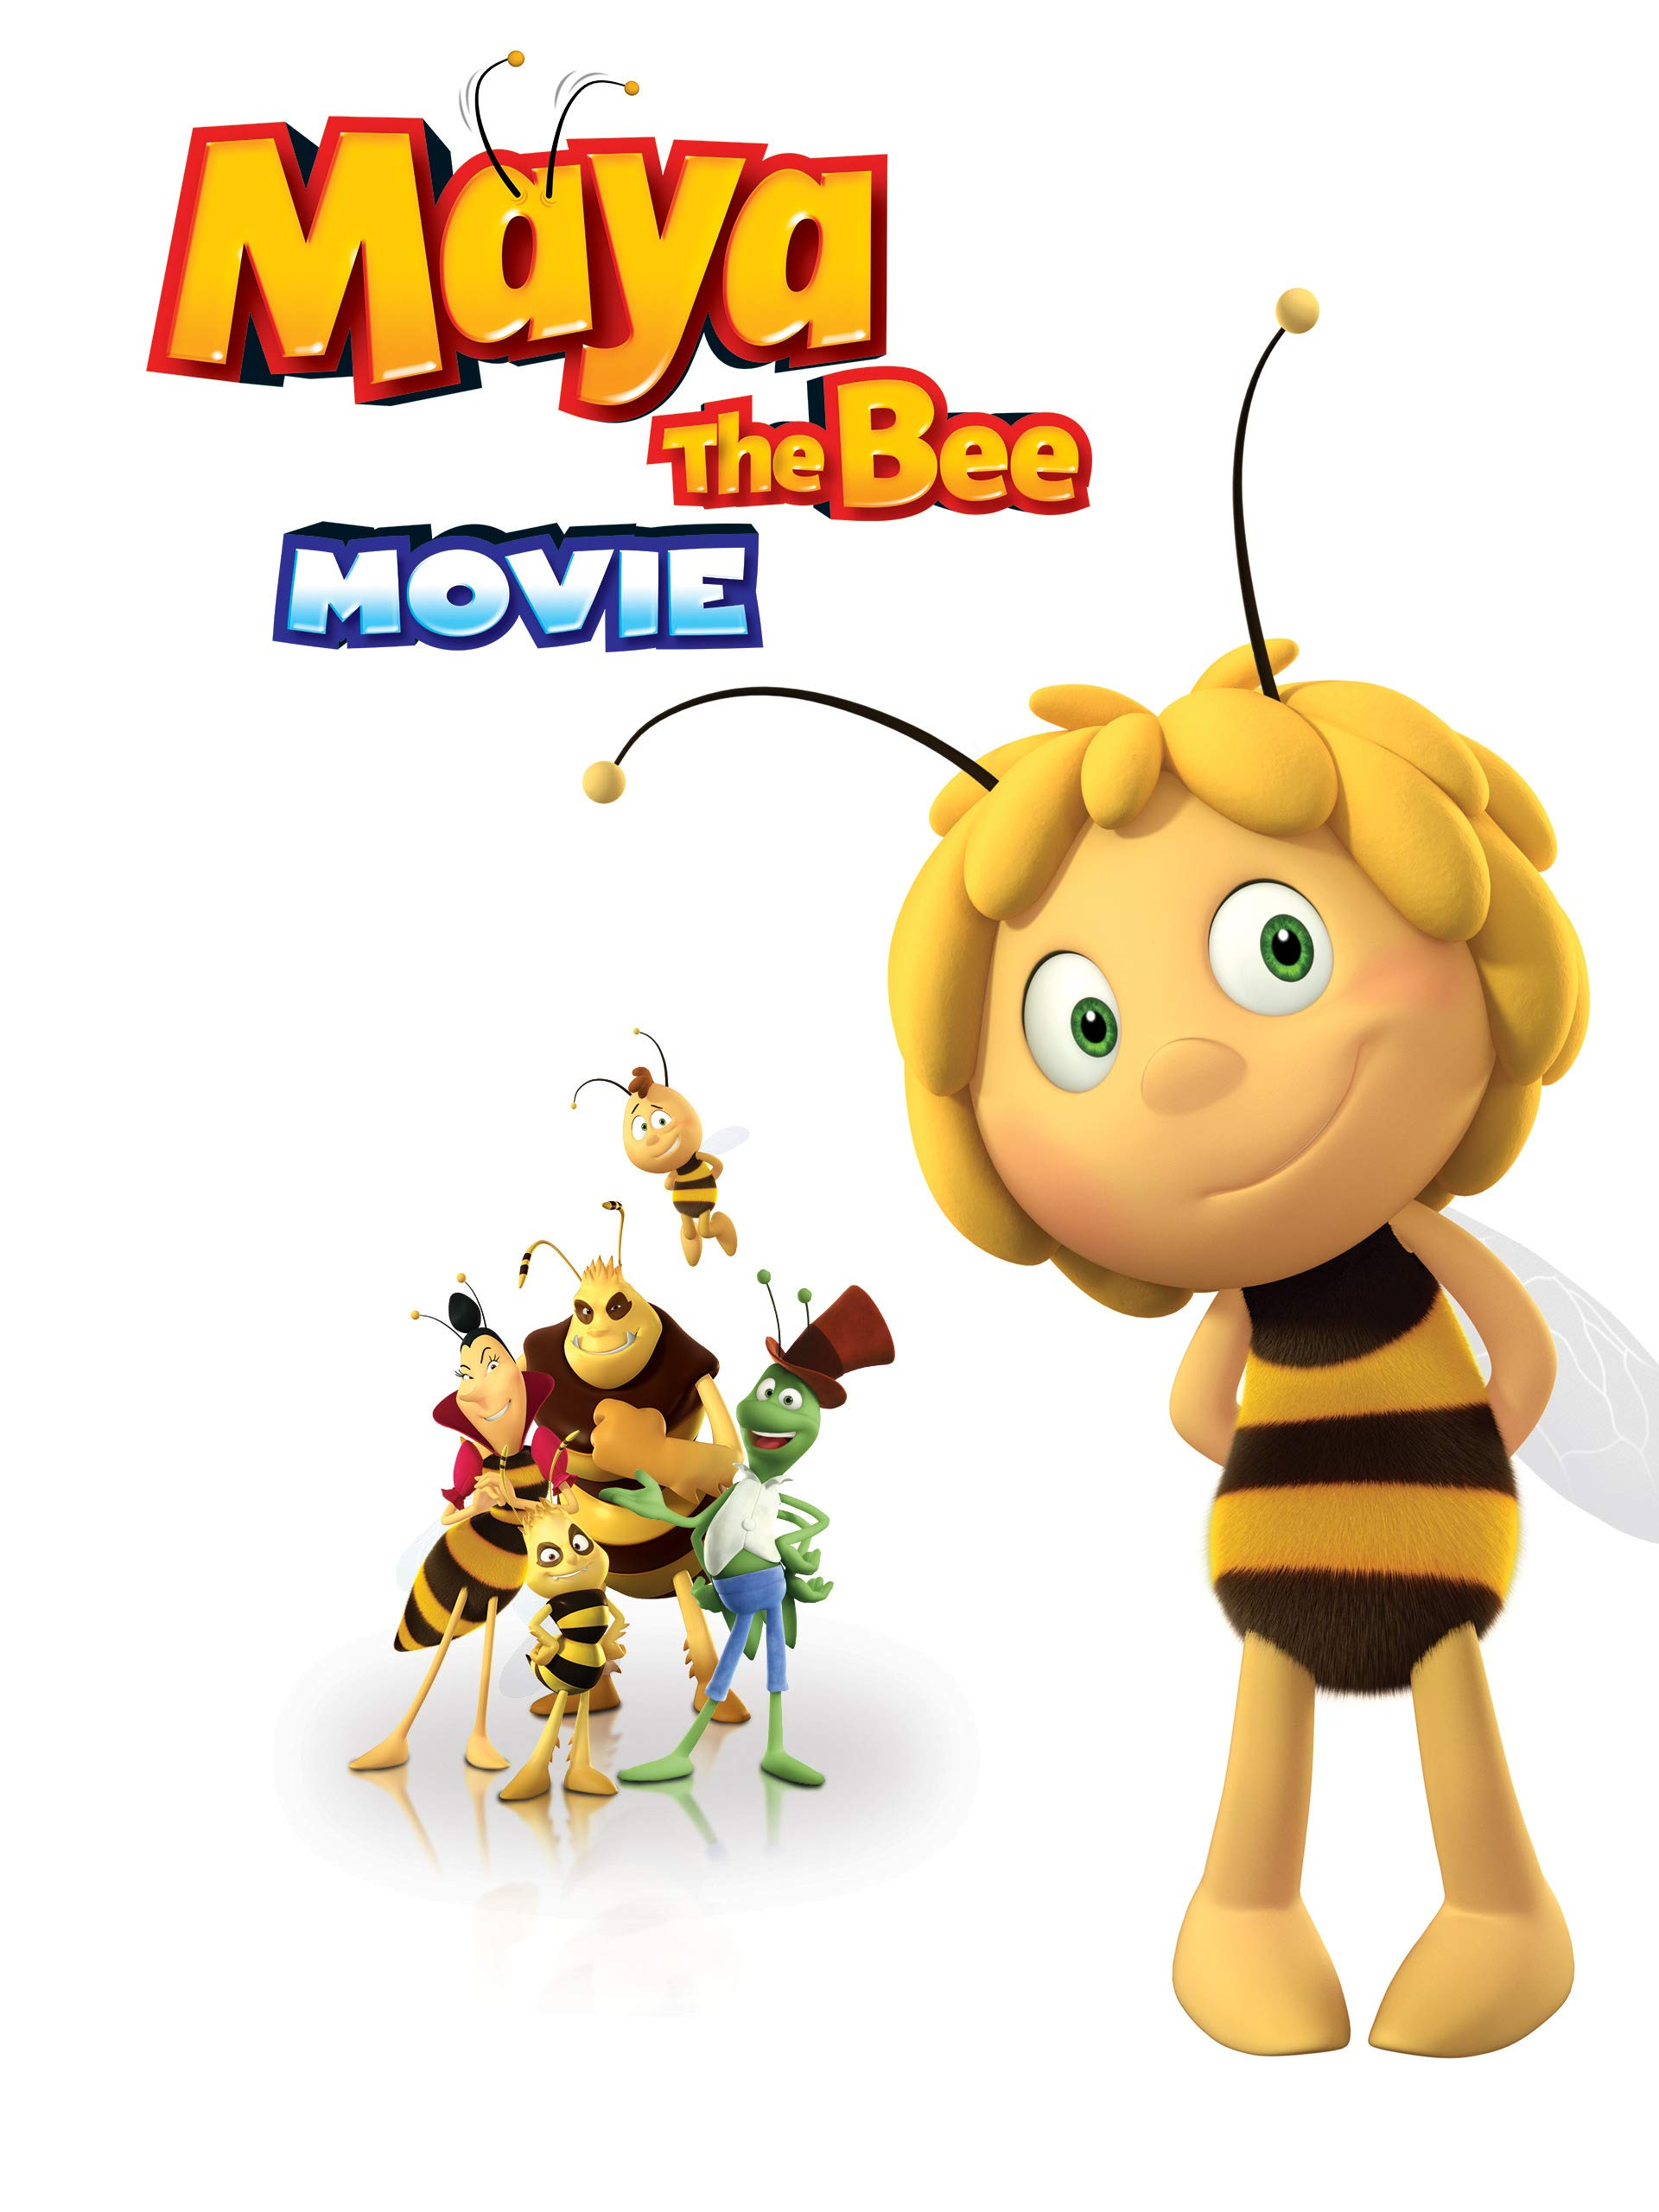 maya the bee movie 2015